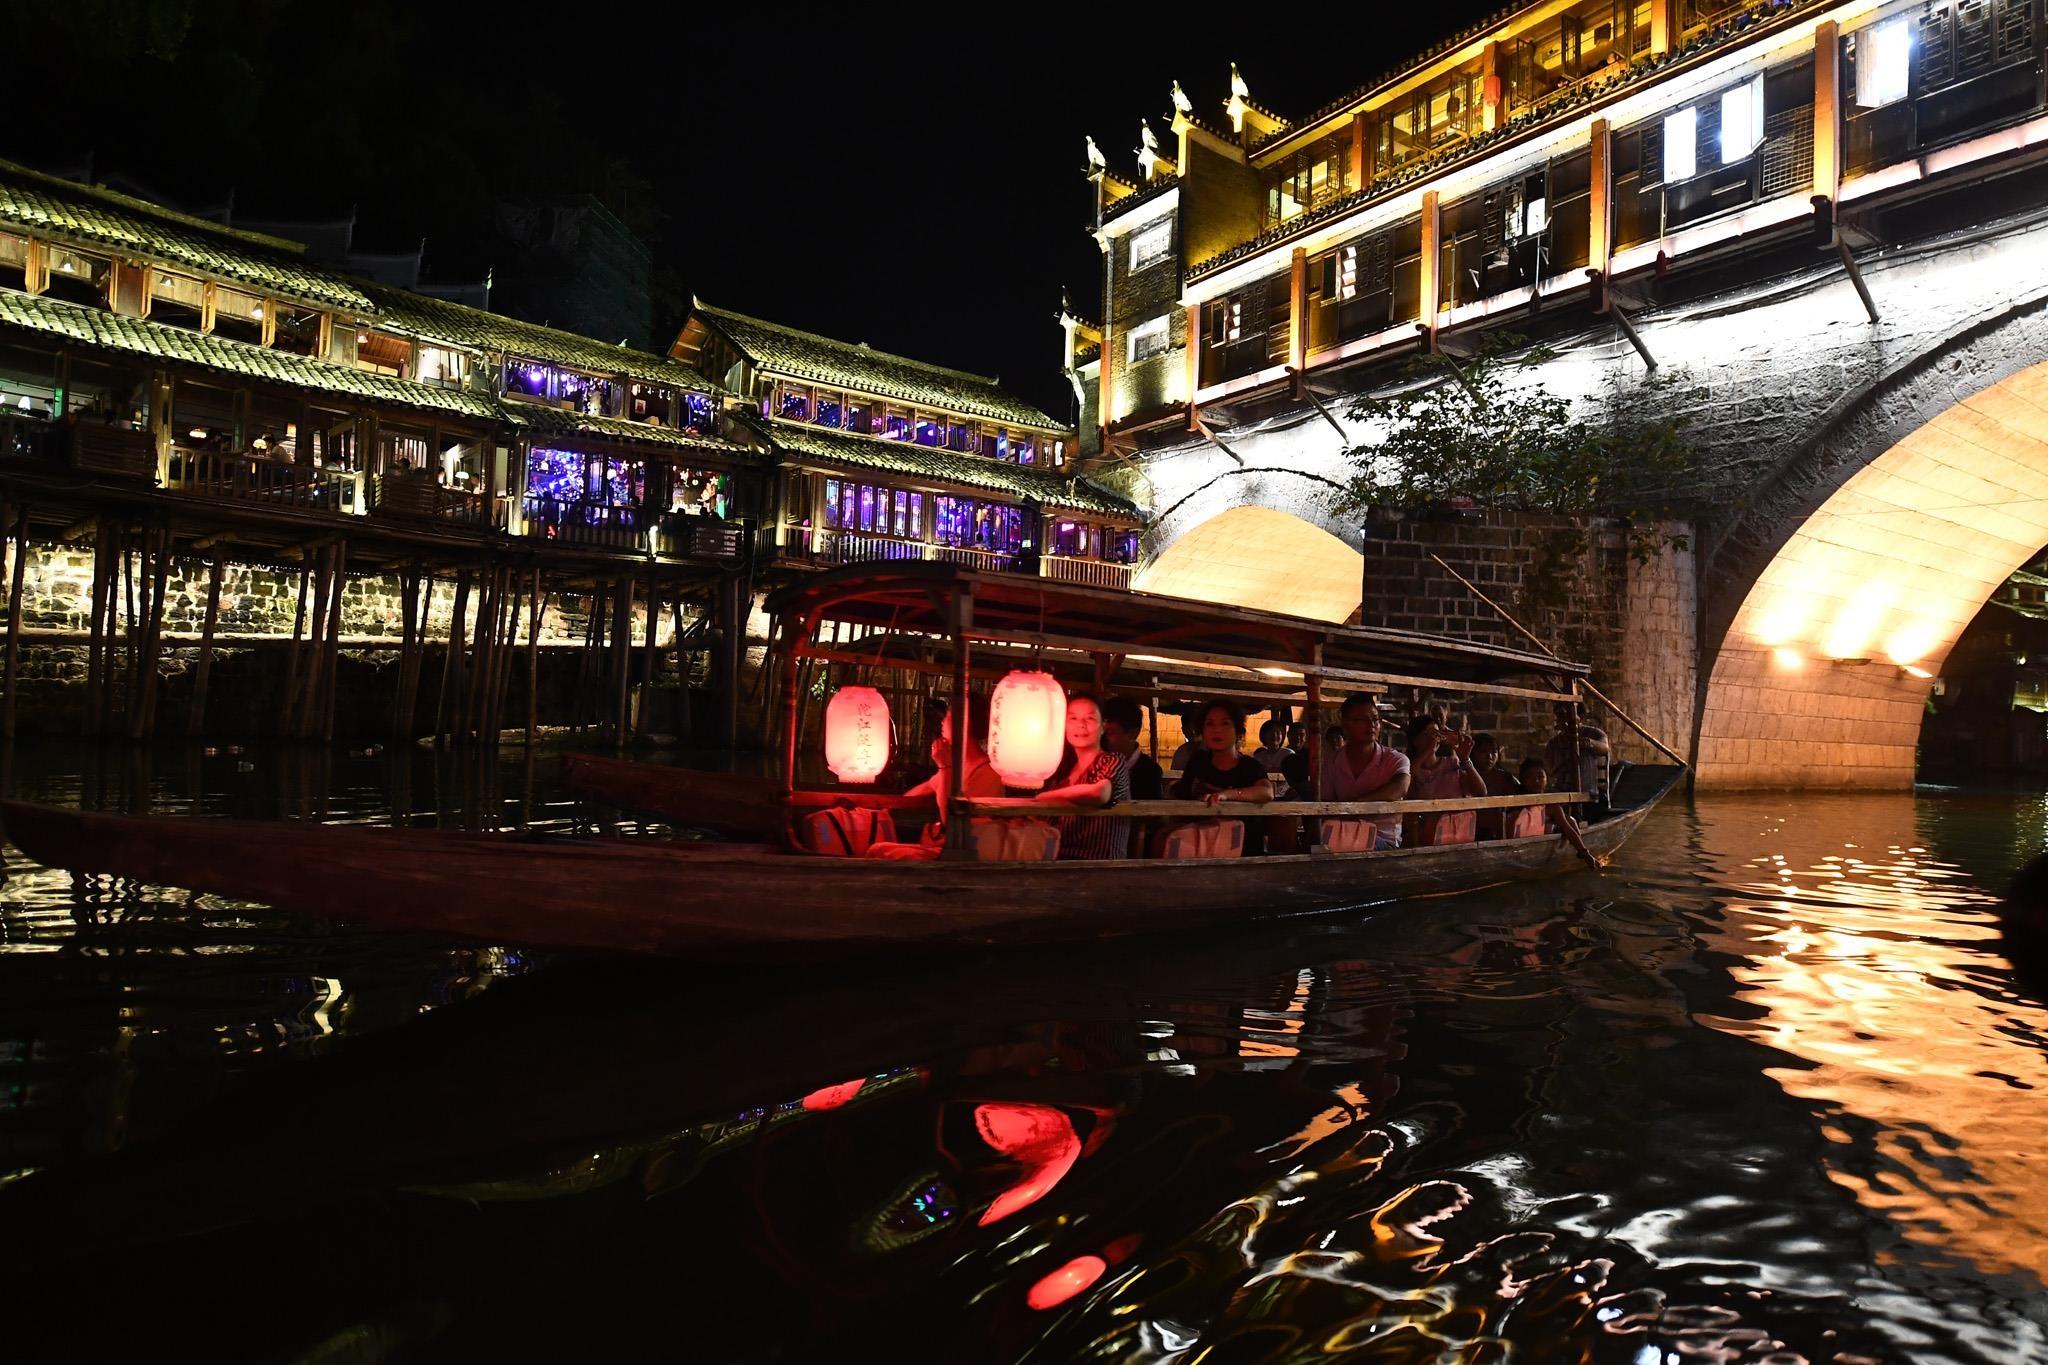 Phuong Hoang co tran va bi mat thu hut khach du lich quanh nam hinh anh 21